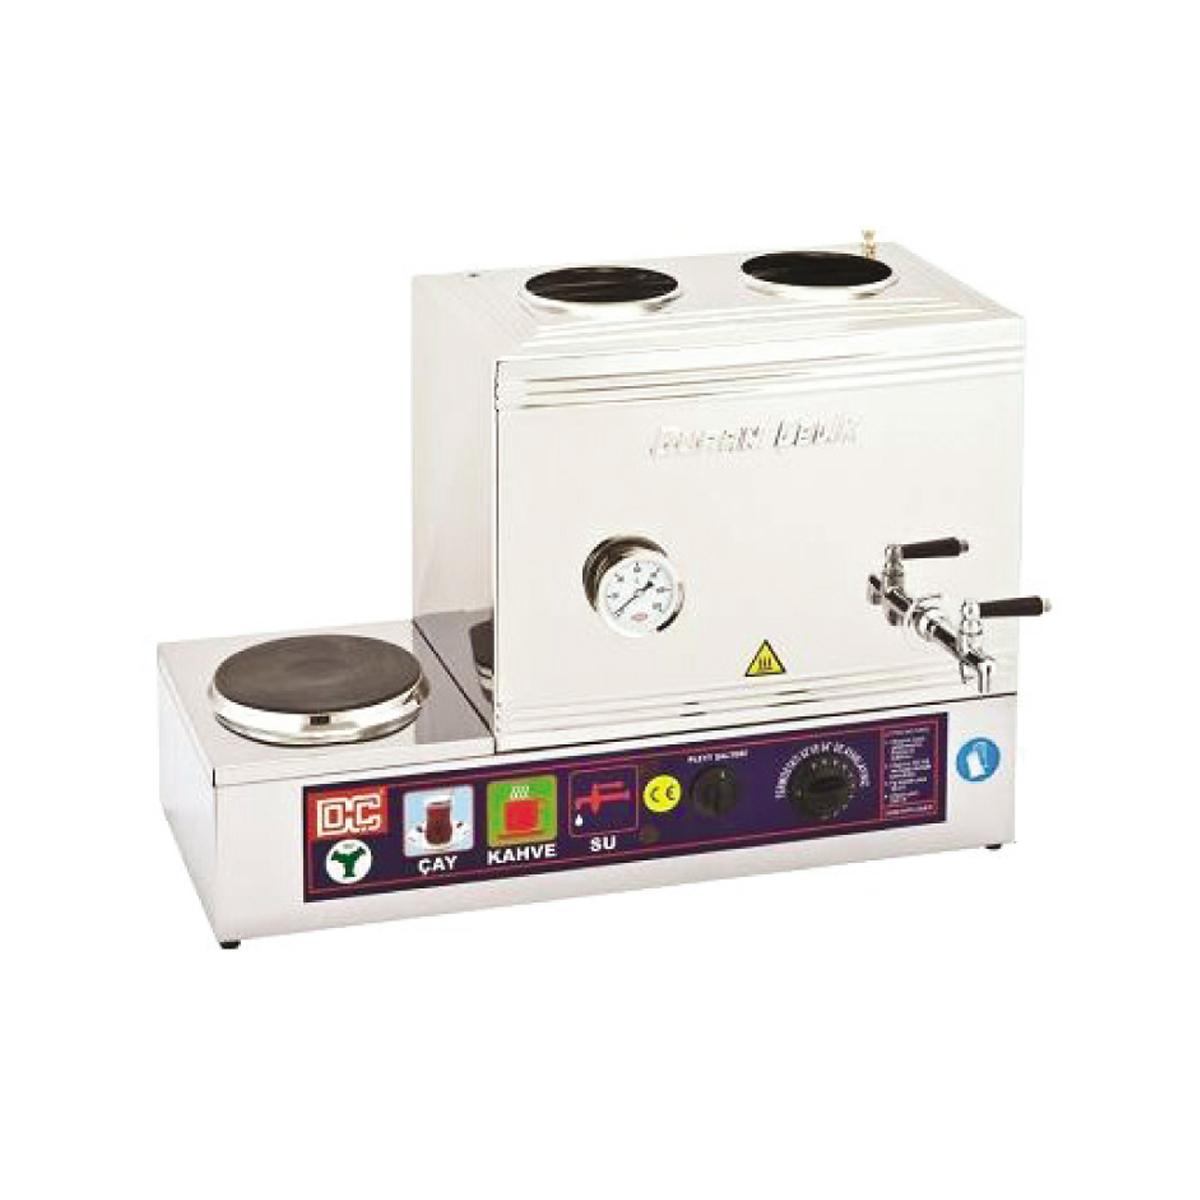 Tea Boiler Threaded 40 - Electric